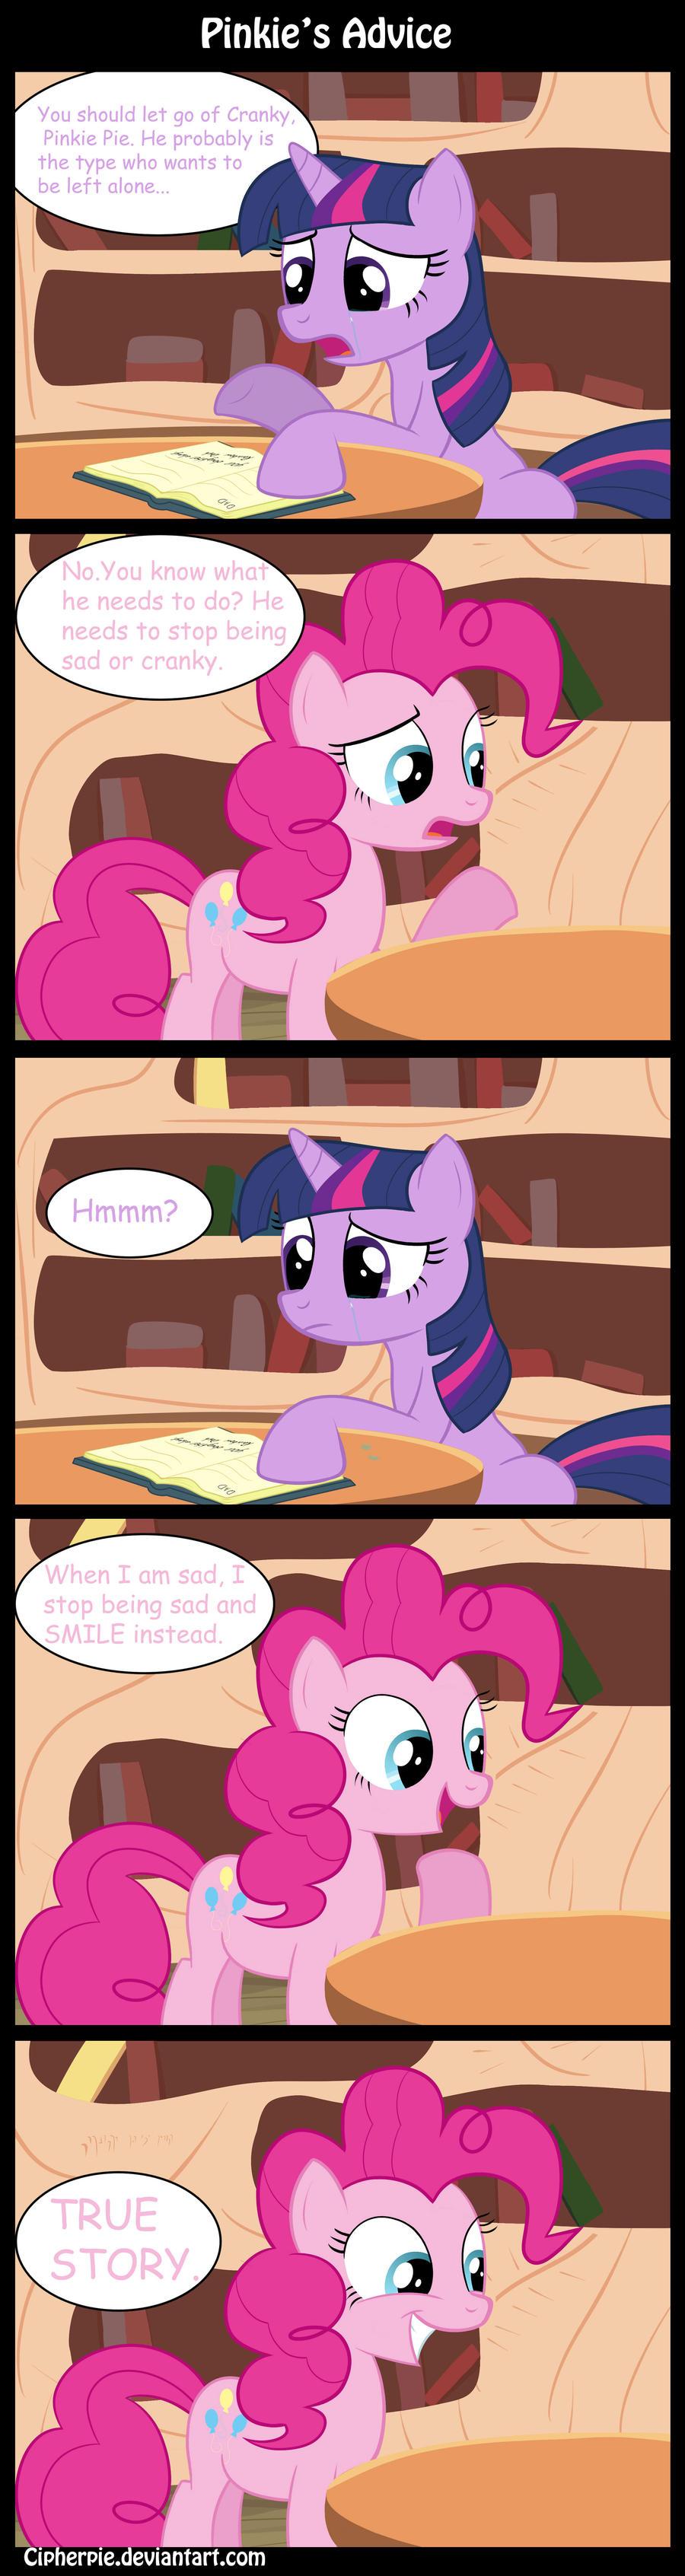 Pinkie's Advice by cipherpie